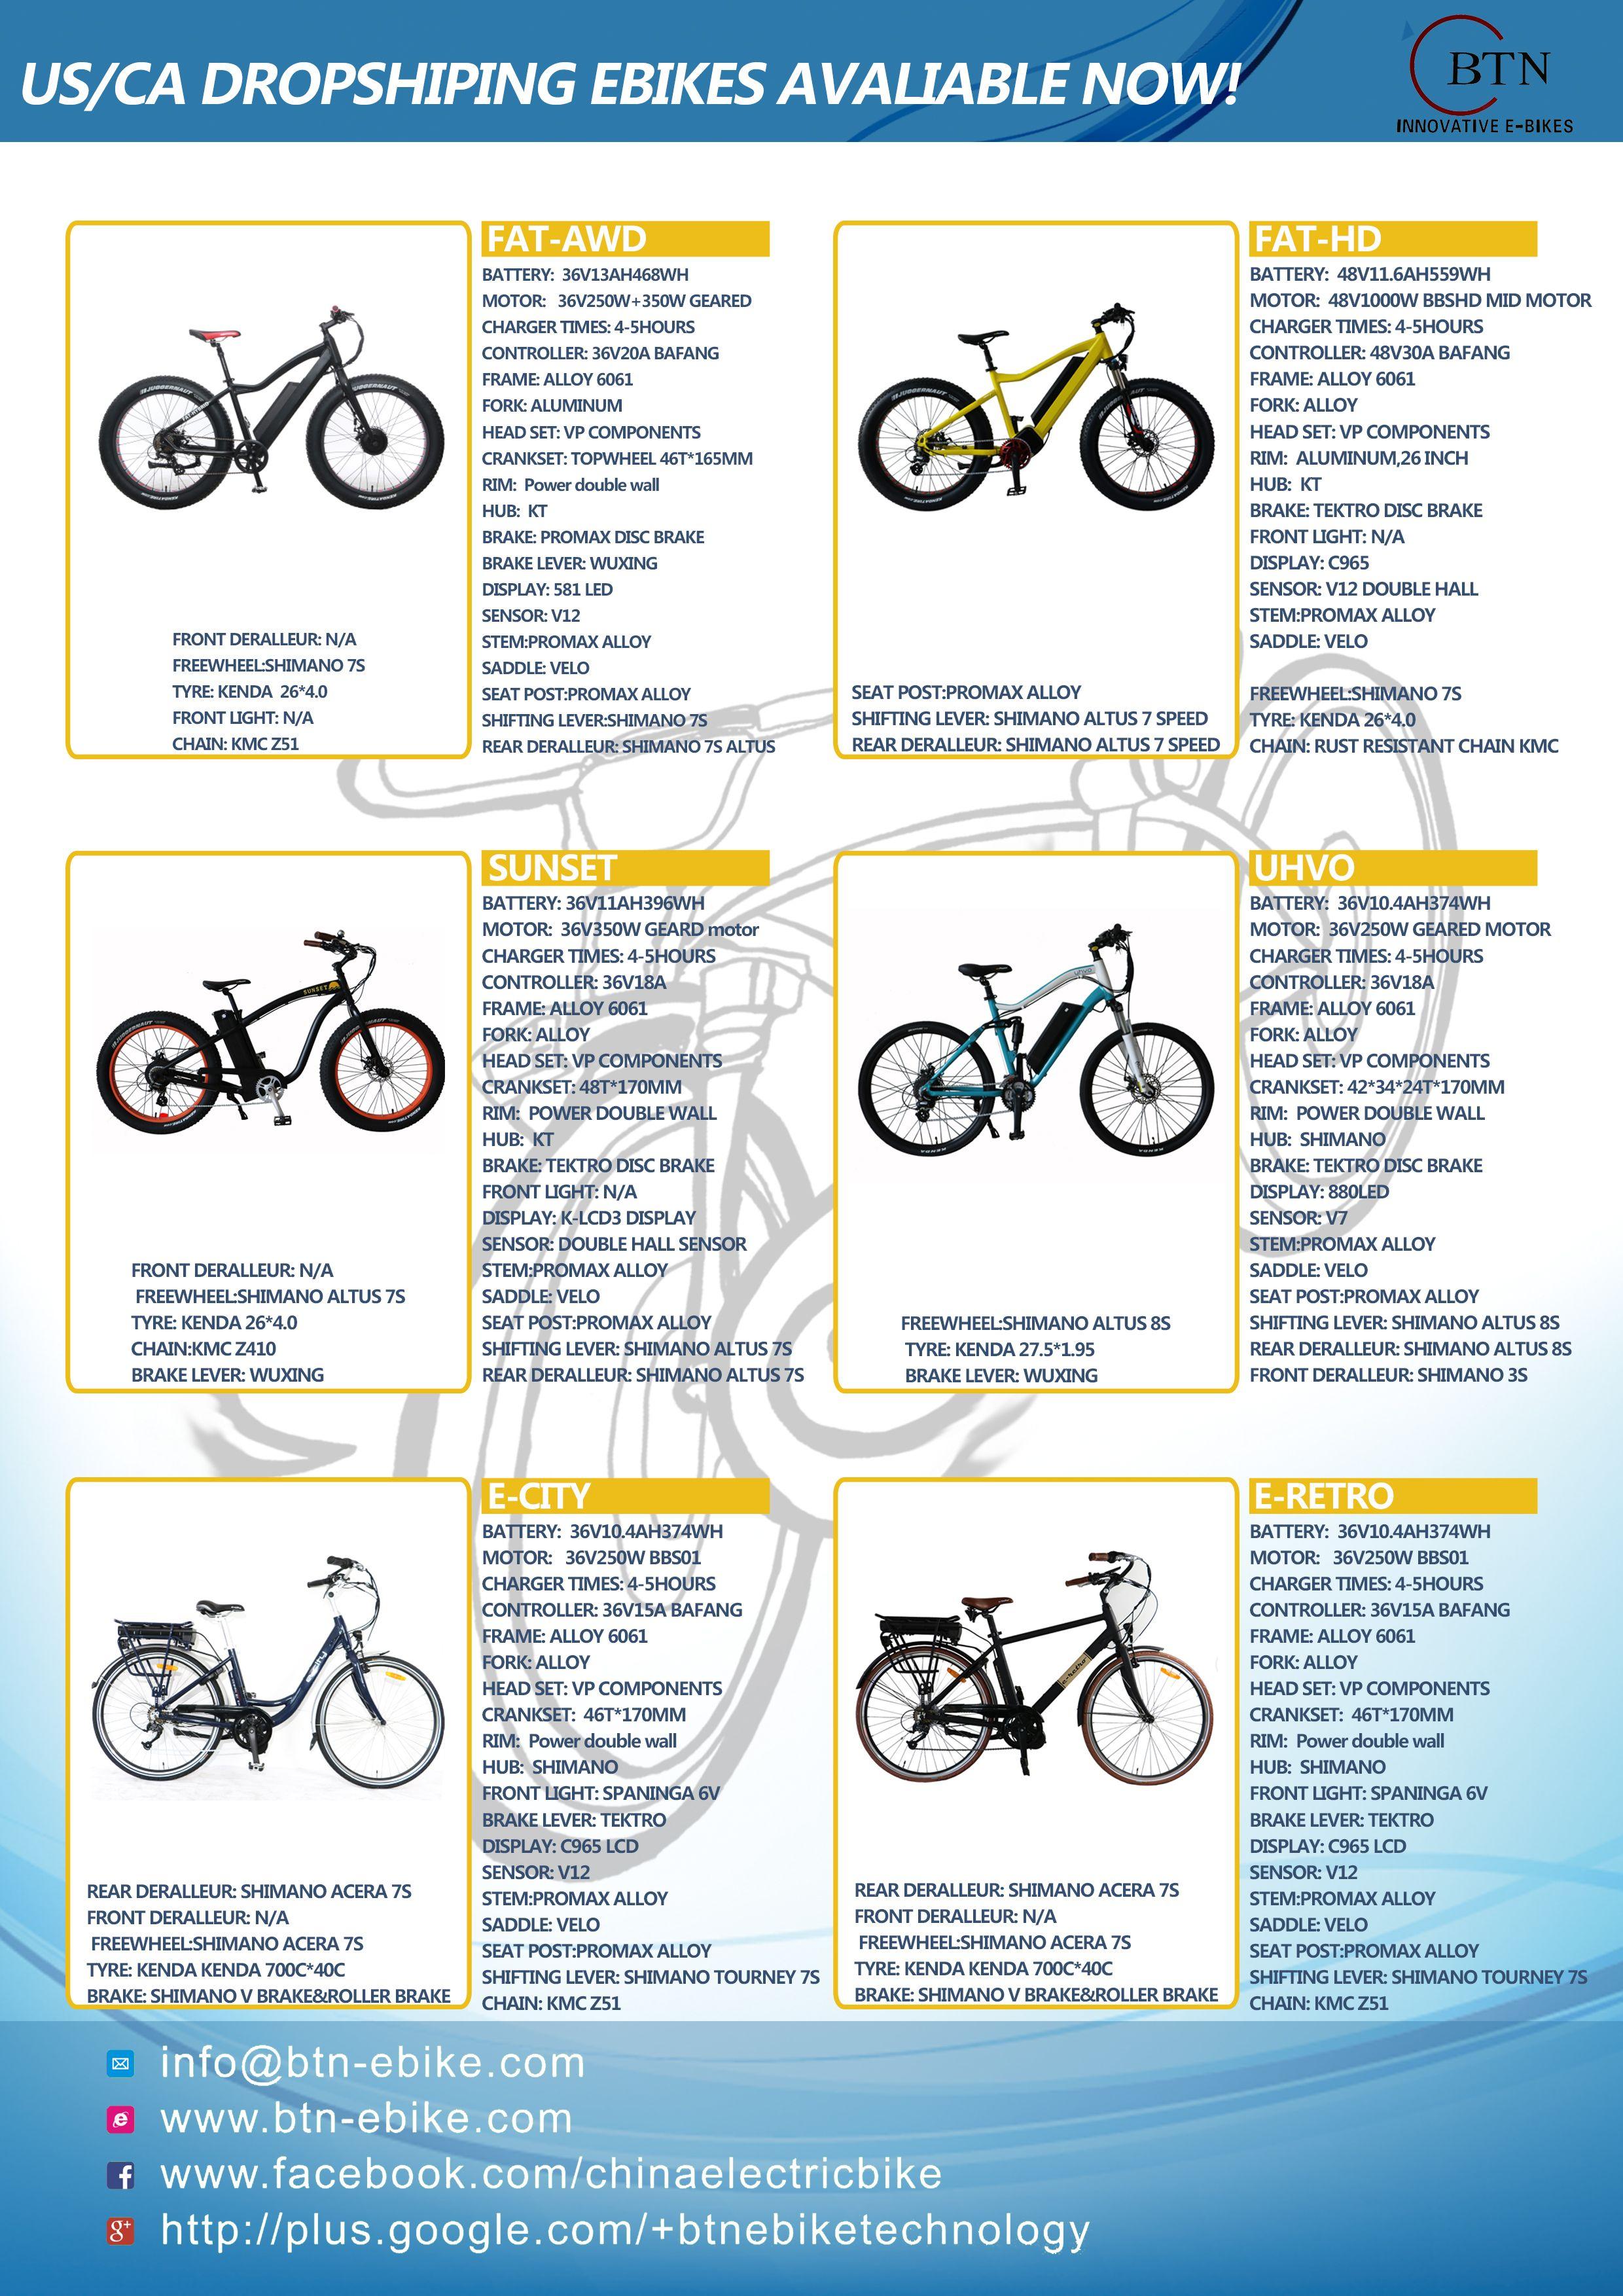 US/CA drop shipping electric bike, You can get a reasonable